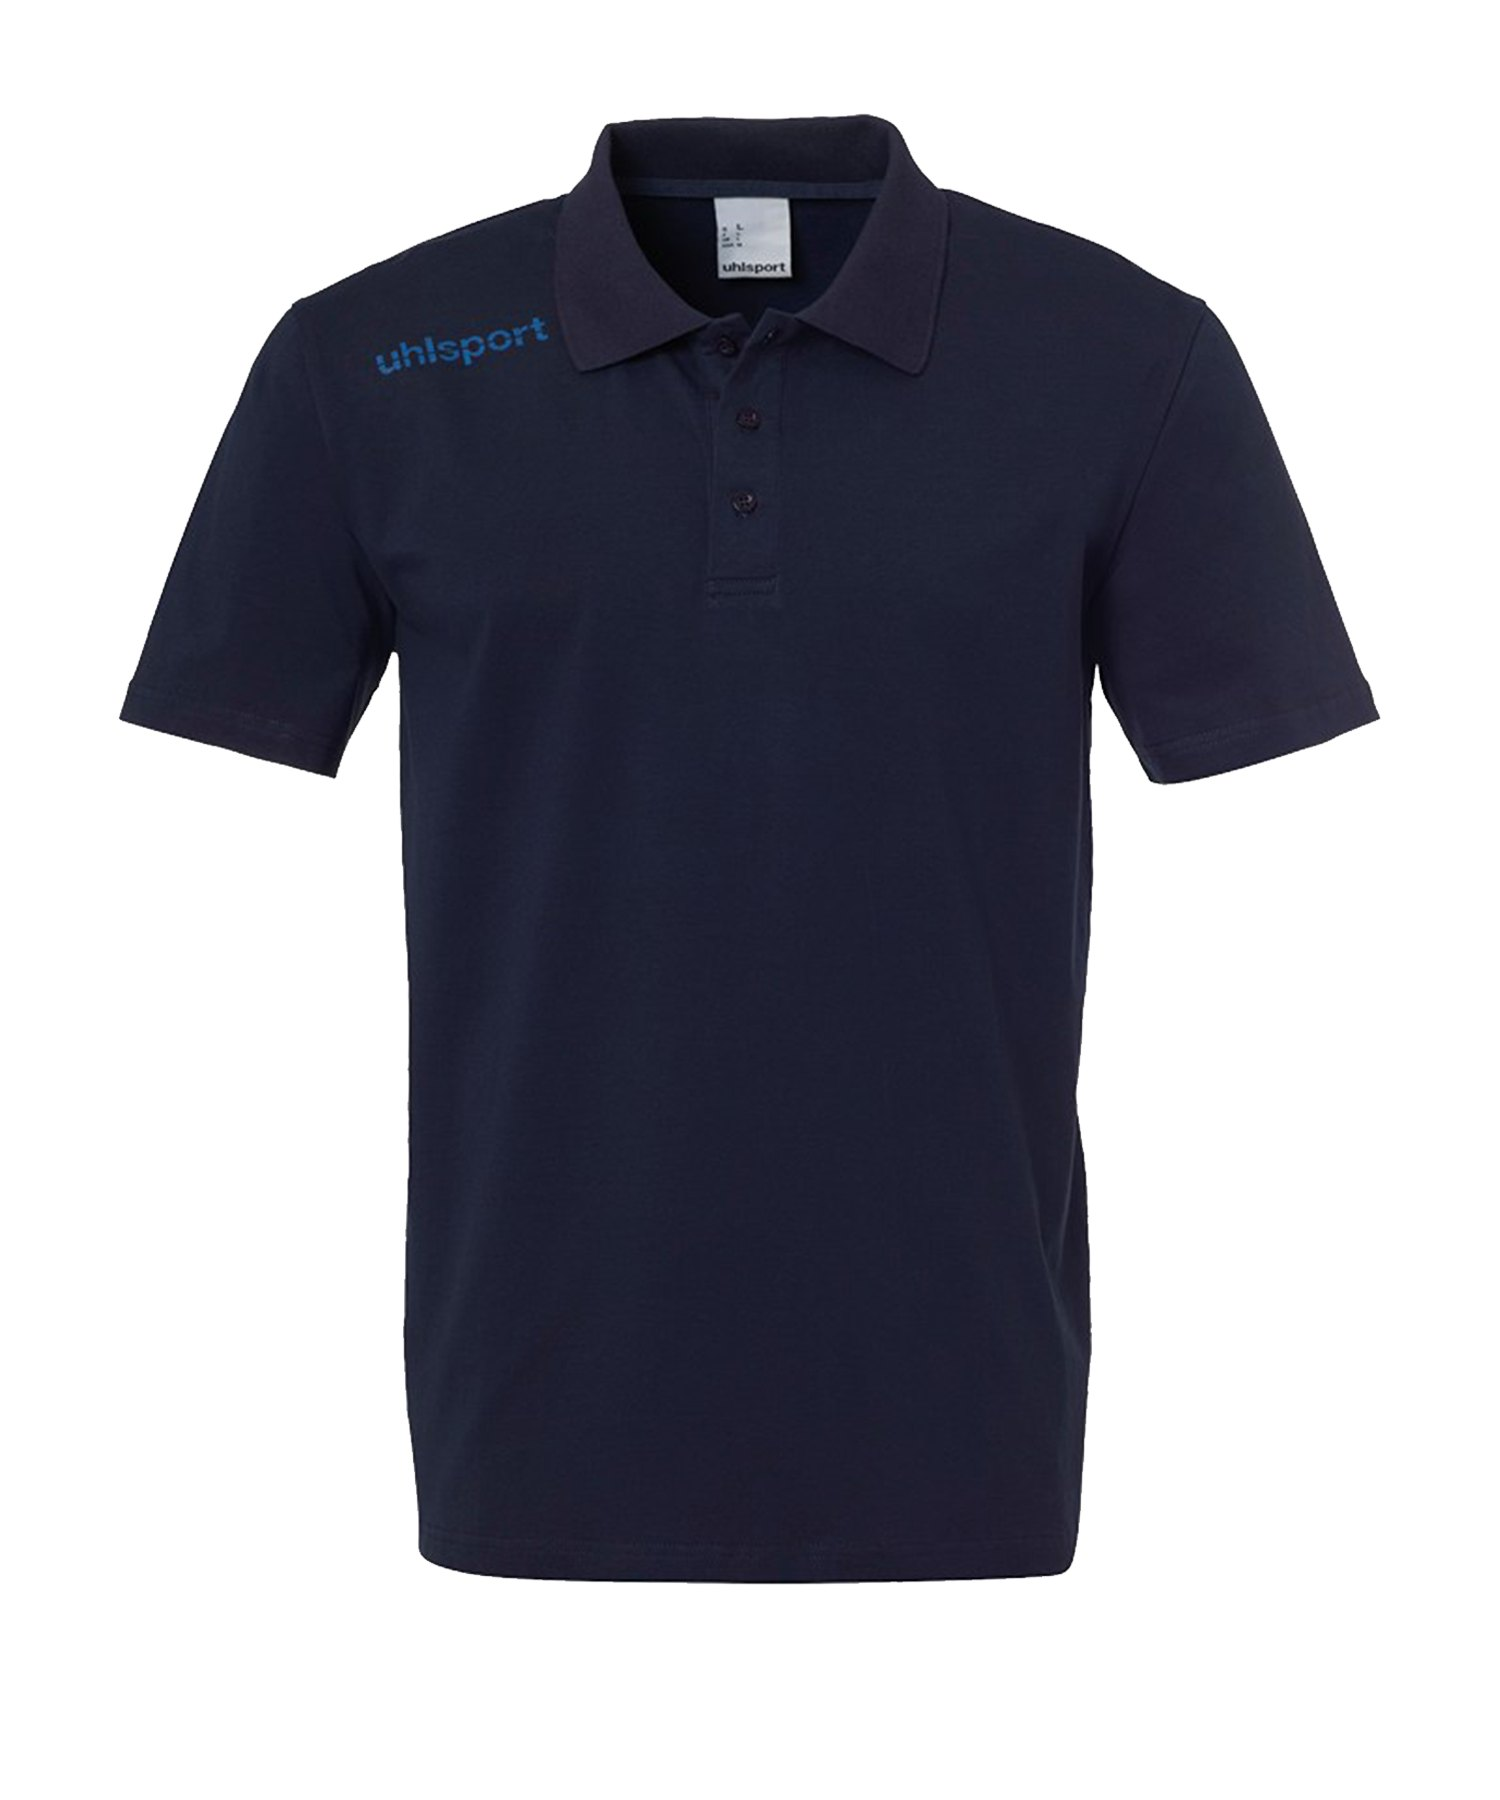 Uhlsport Essential Poloshirt Blau F12 - Blau